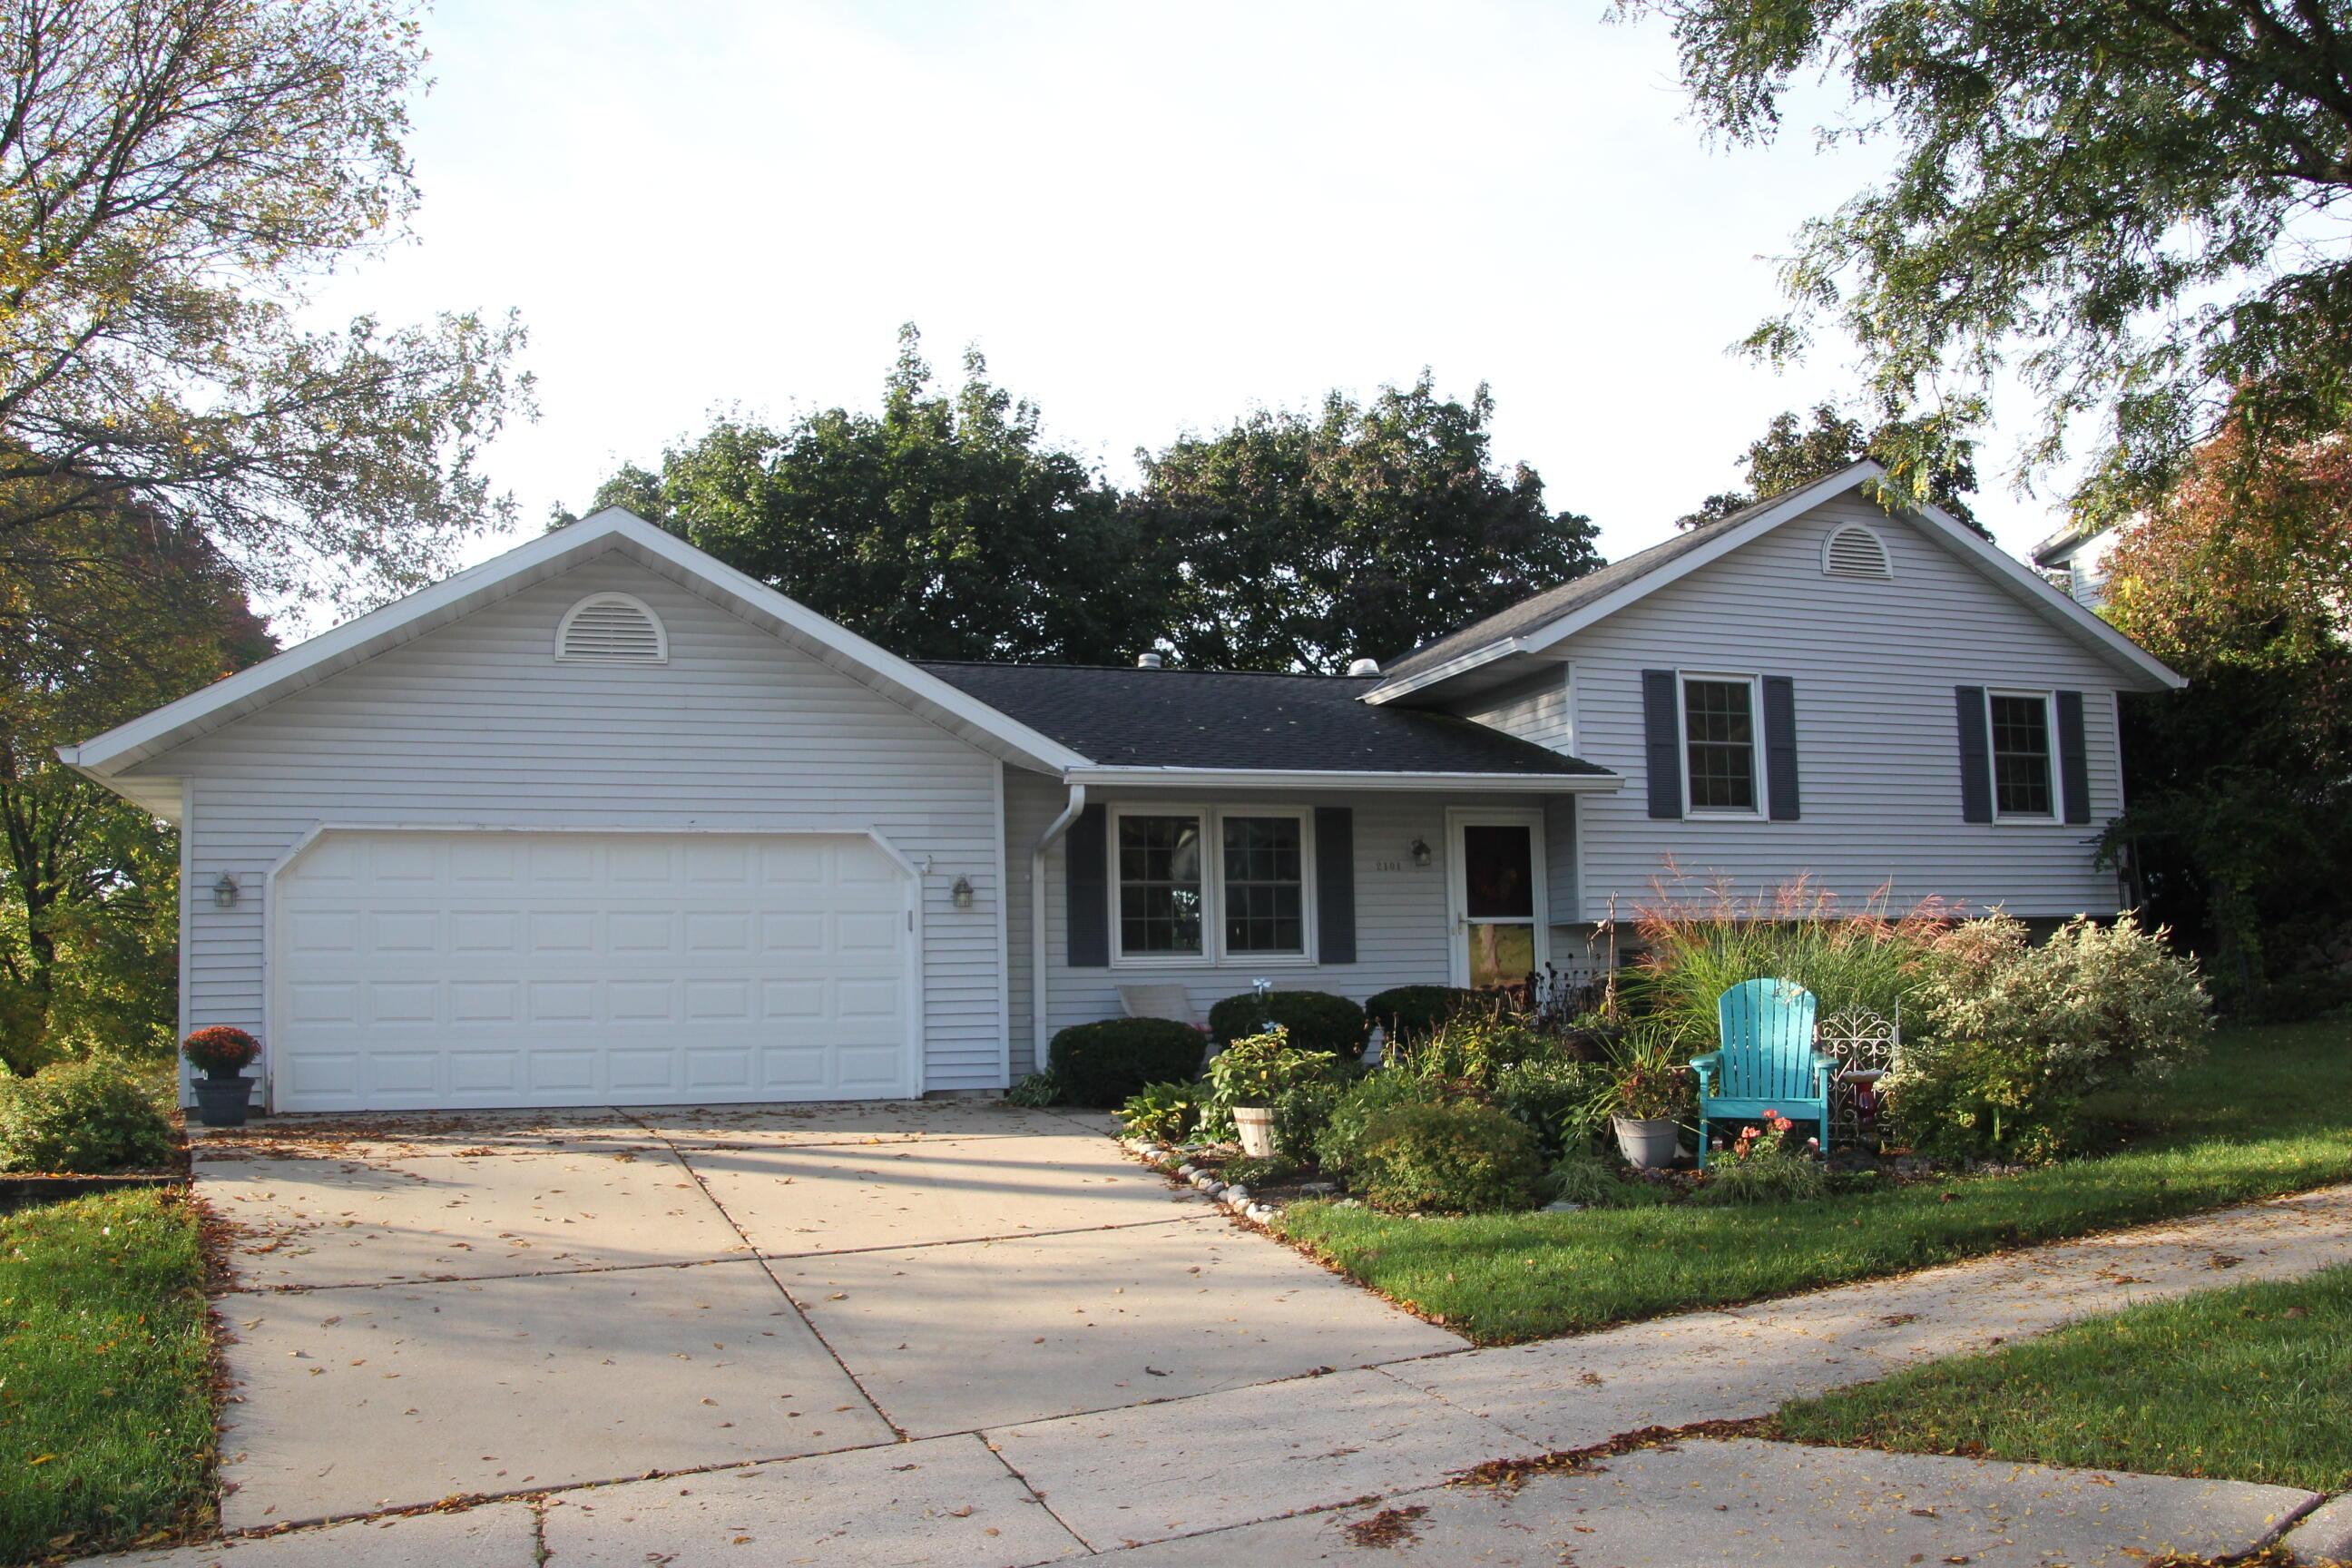 2101 Park View Ct, Waukesha, Wisconsin 53188, 3 Bedrooms Bedrooms, 7 Rooms Rooms,2 BathroomsBathrooms,Single-Family,For Sale,Park View Ct,1767977